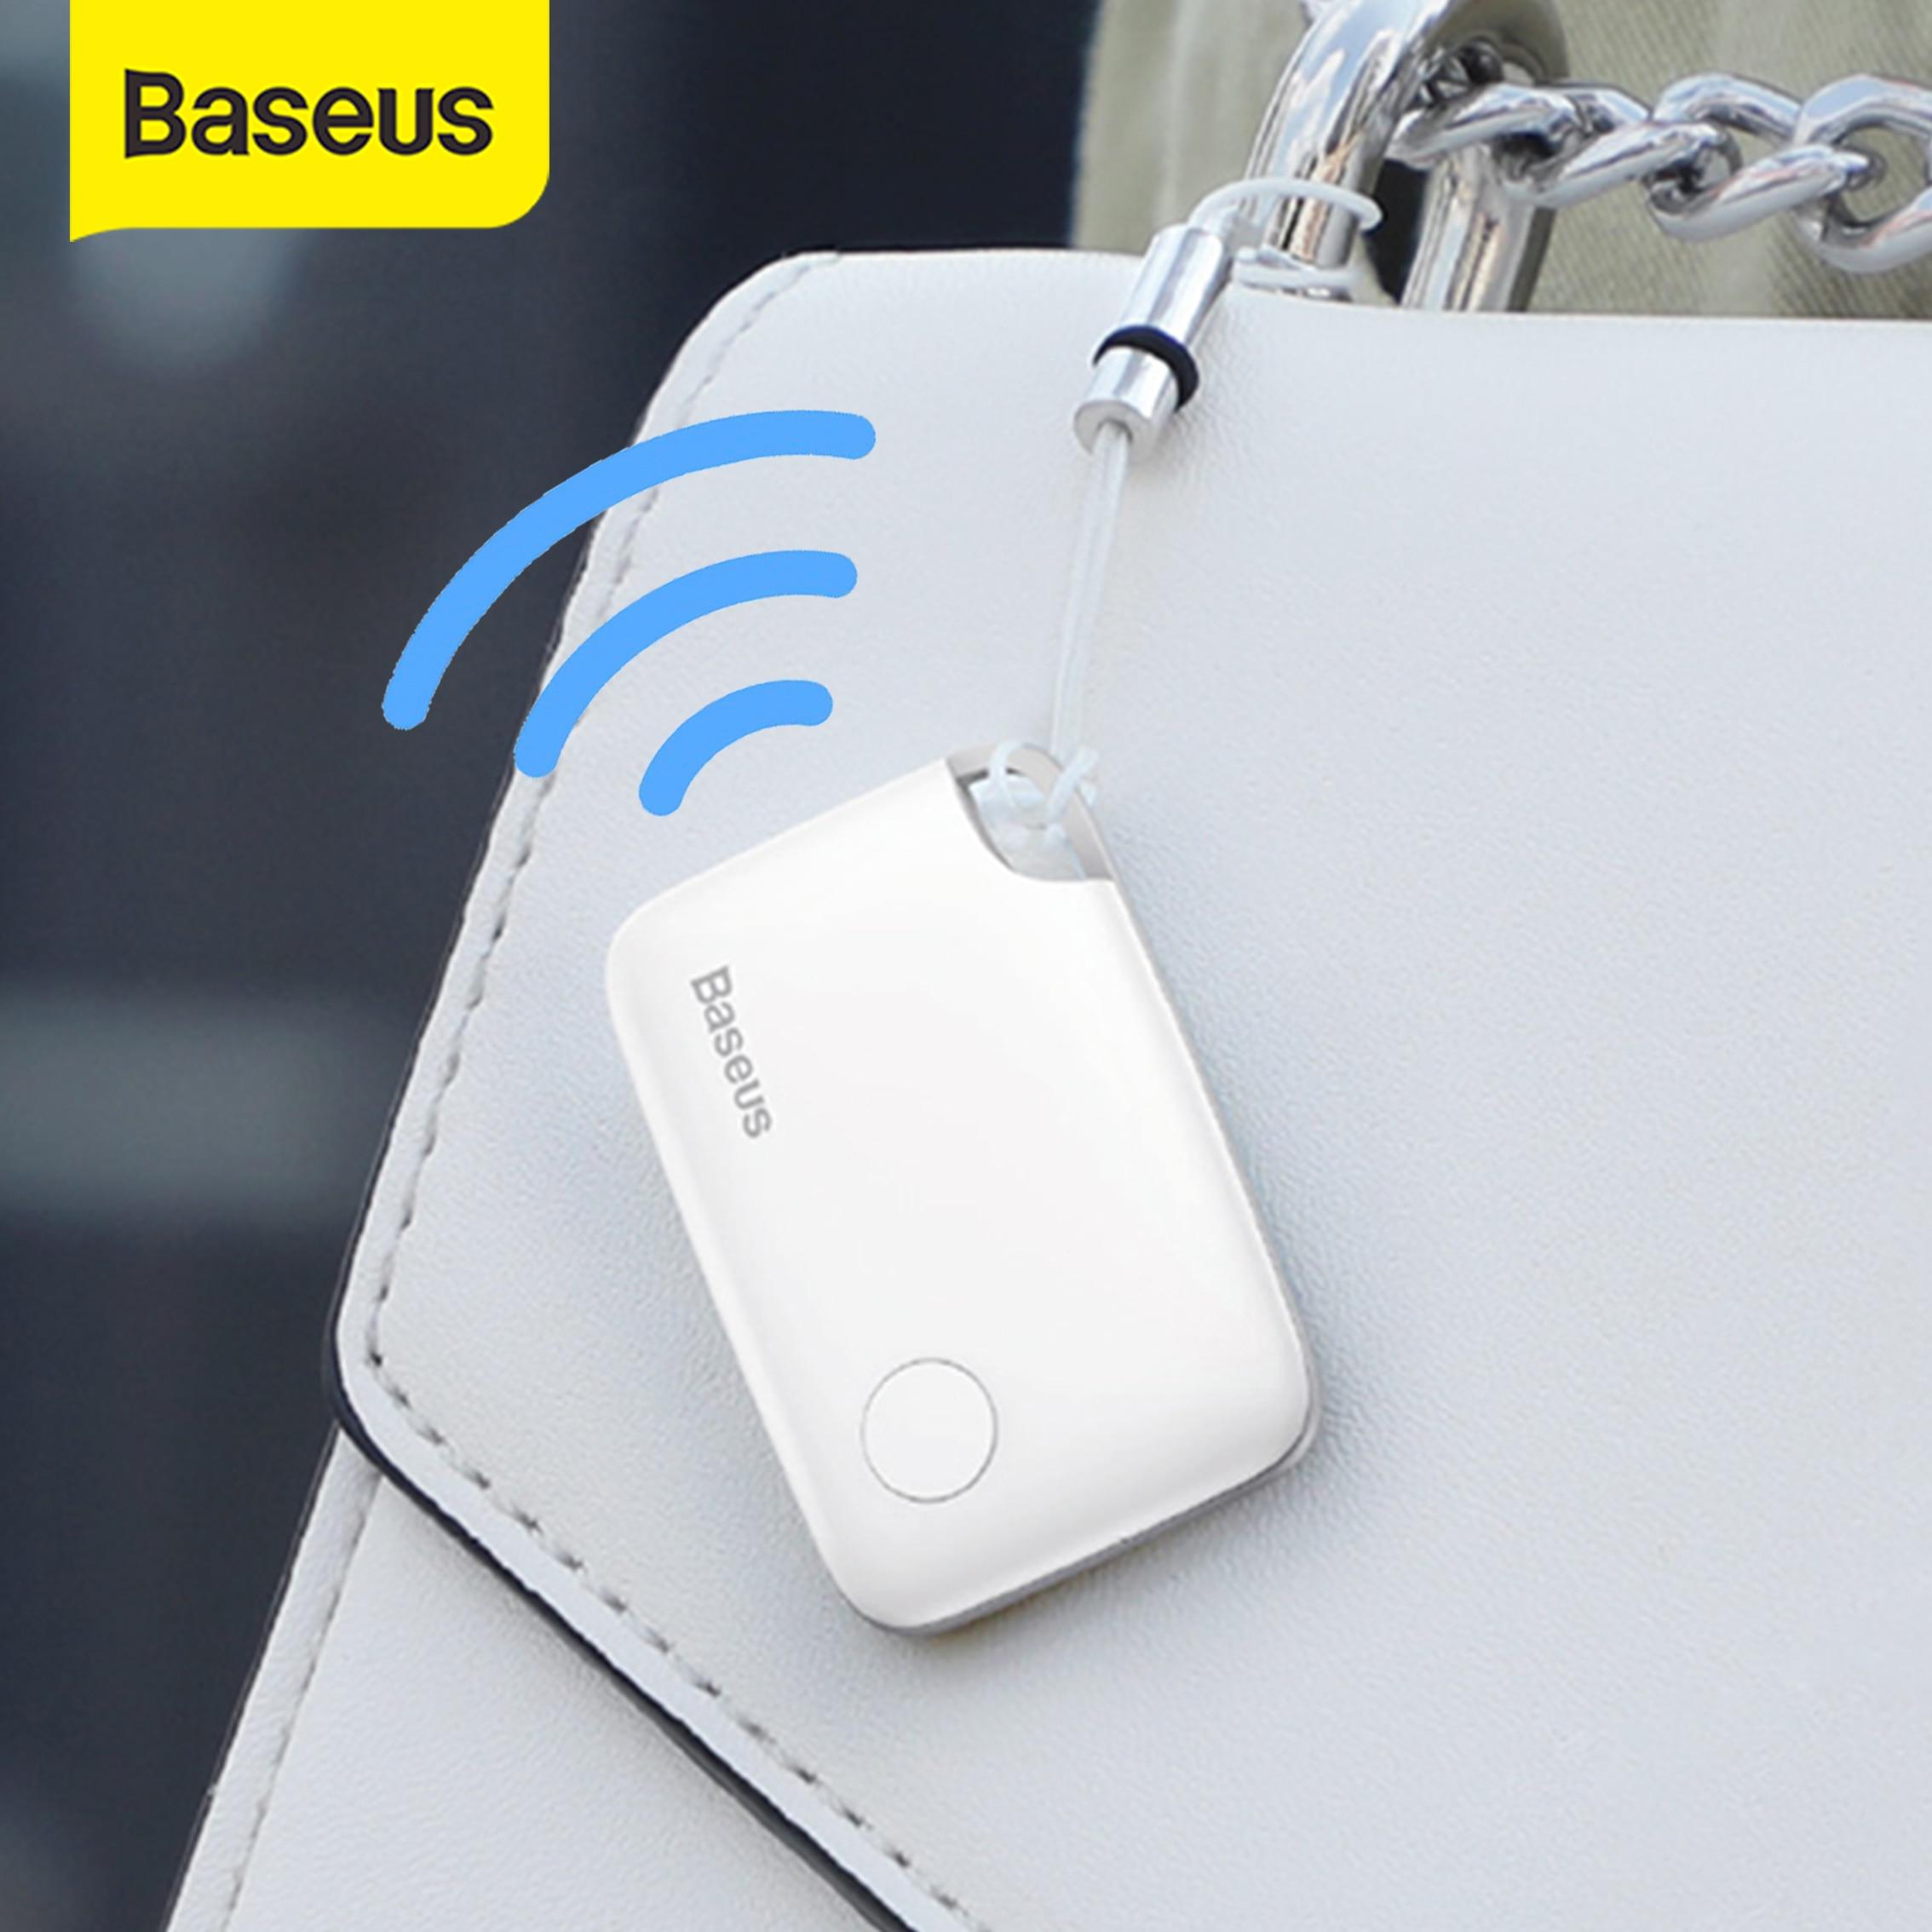 Baseus Anti-lost Alarm Smart Tracker Wireless Tracker Key Finder Child Bag Wallet Finder  GPS Locator Bluetooth Anti Lost Alarm